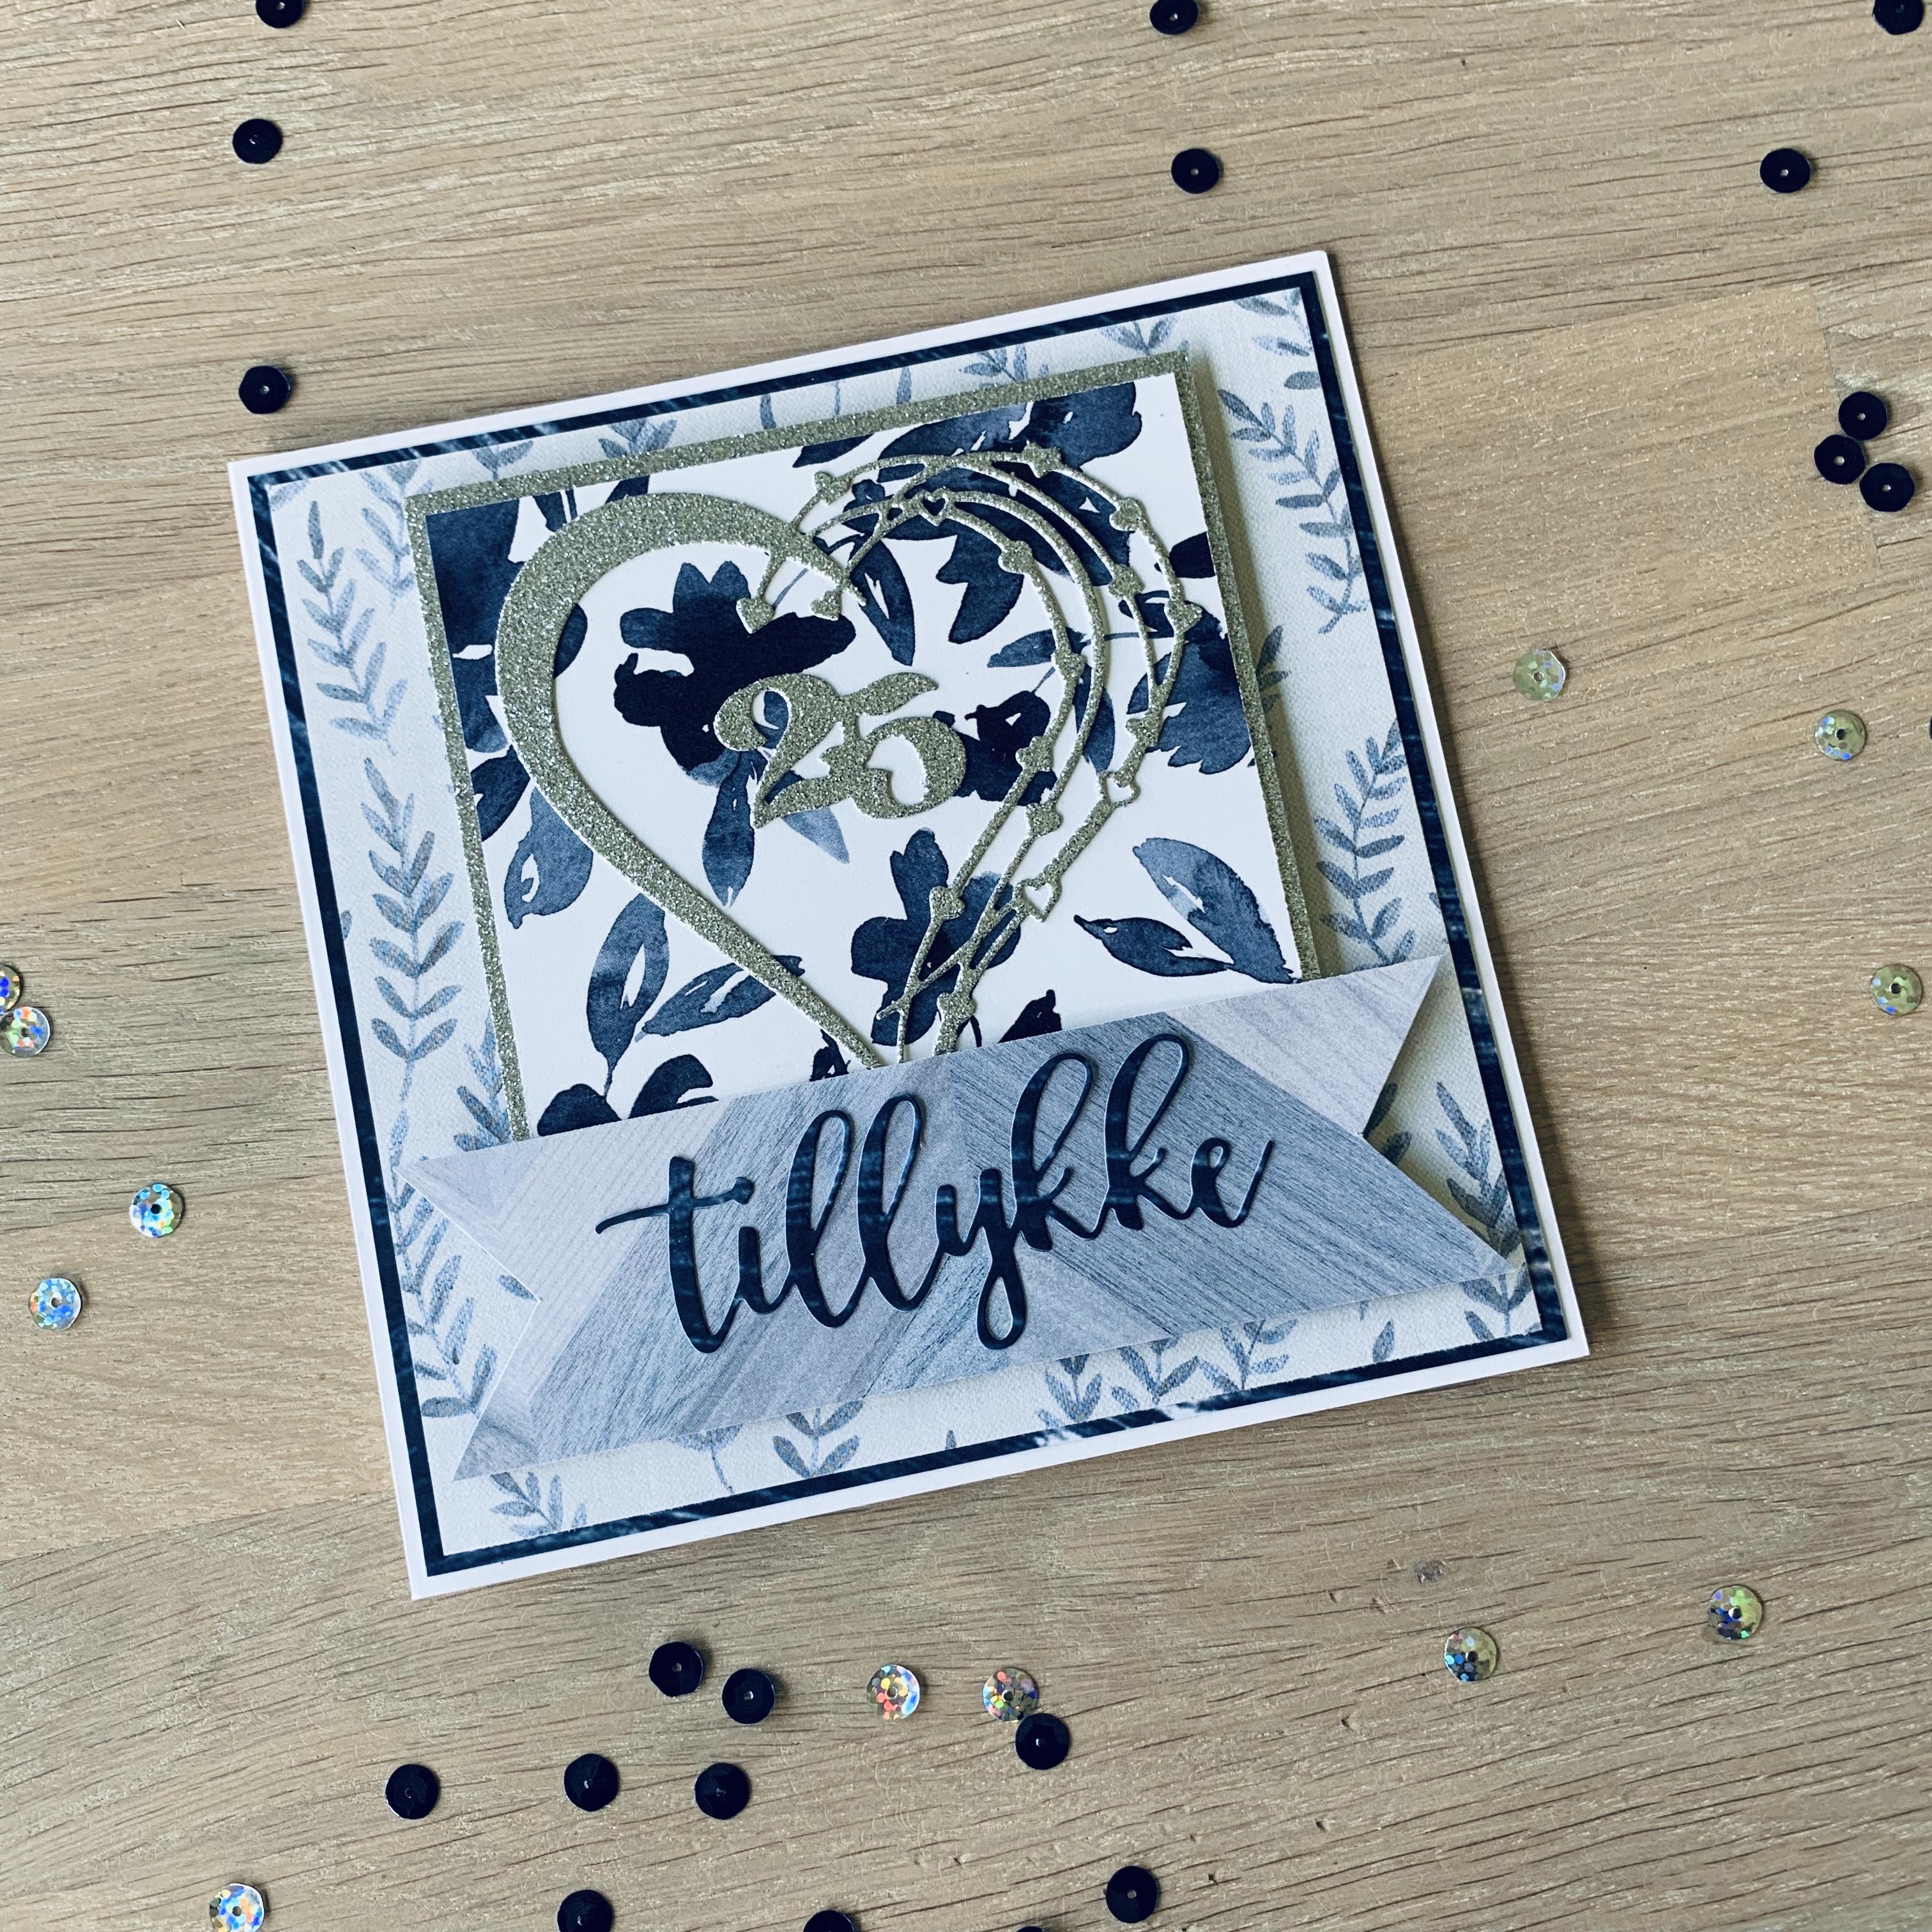 Sølvbryllupskort med septemberkittet